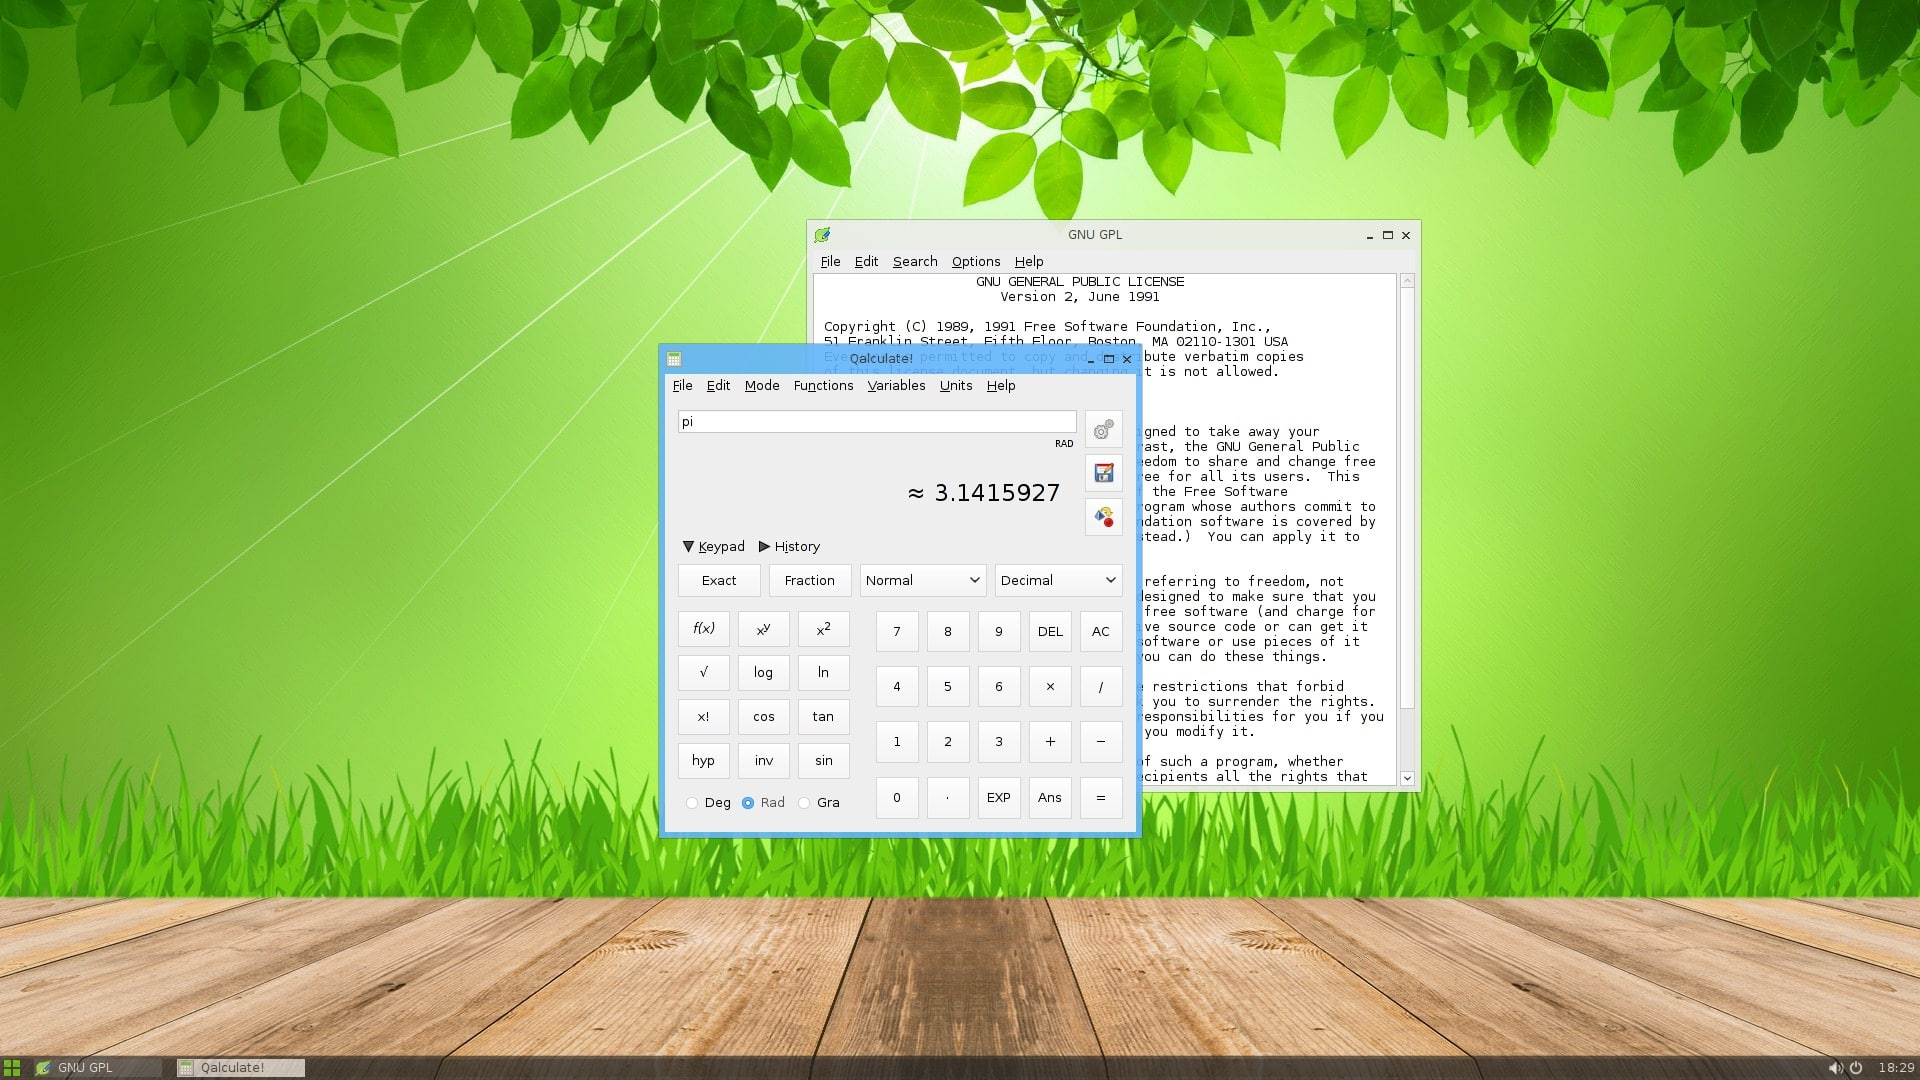 Nova versão do Slax Linux